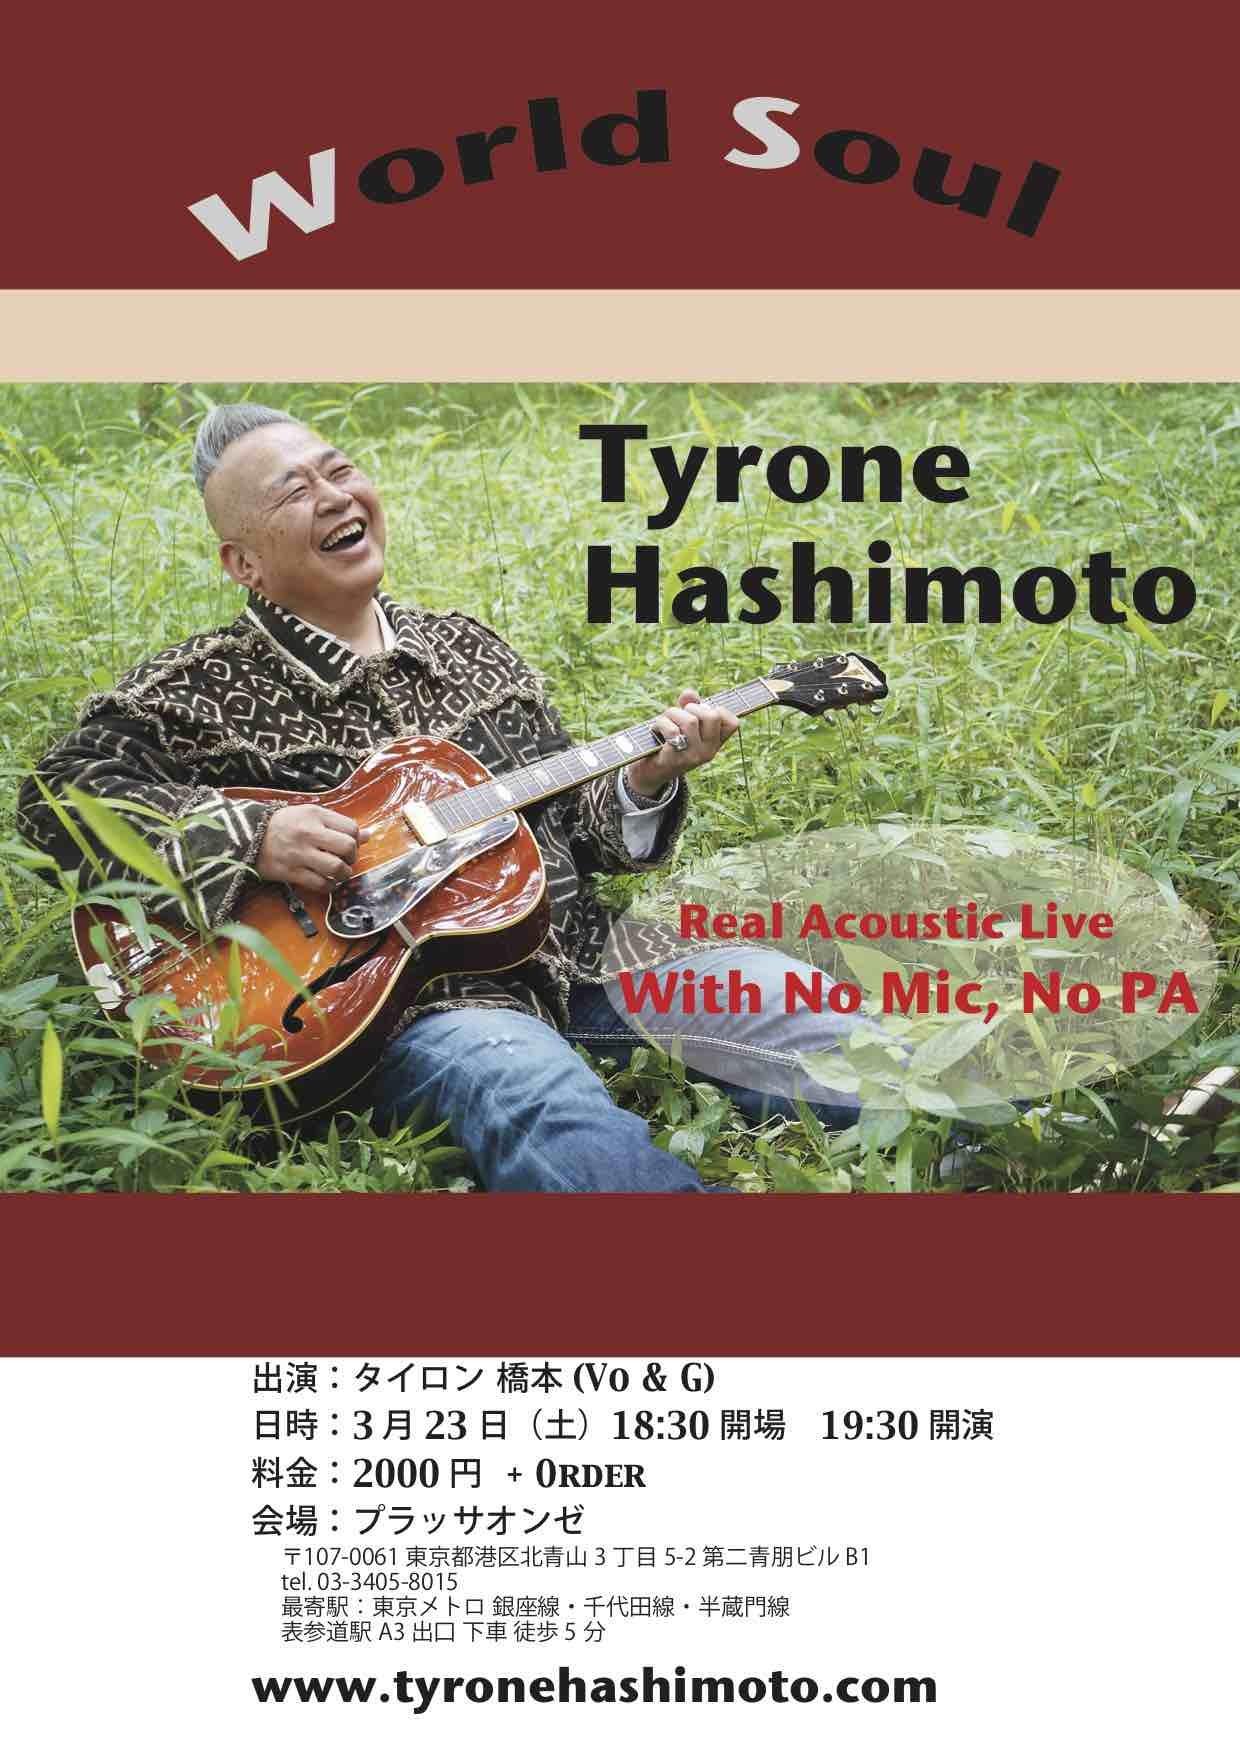 Tyrone Hashimoto 3月 ライブ情報_c0368808_06032803.jpg